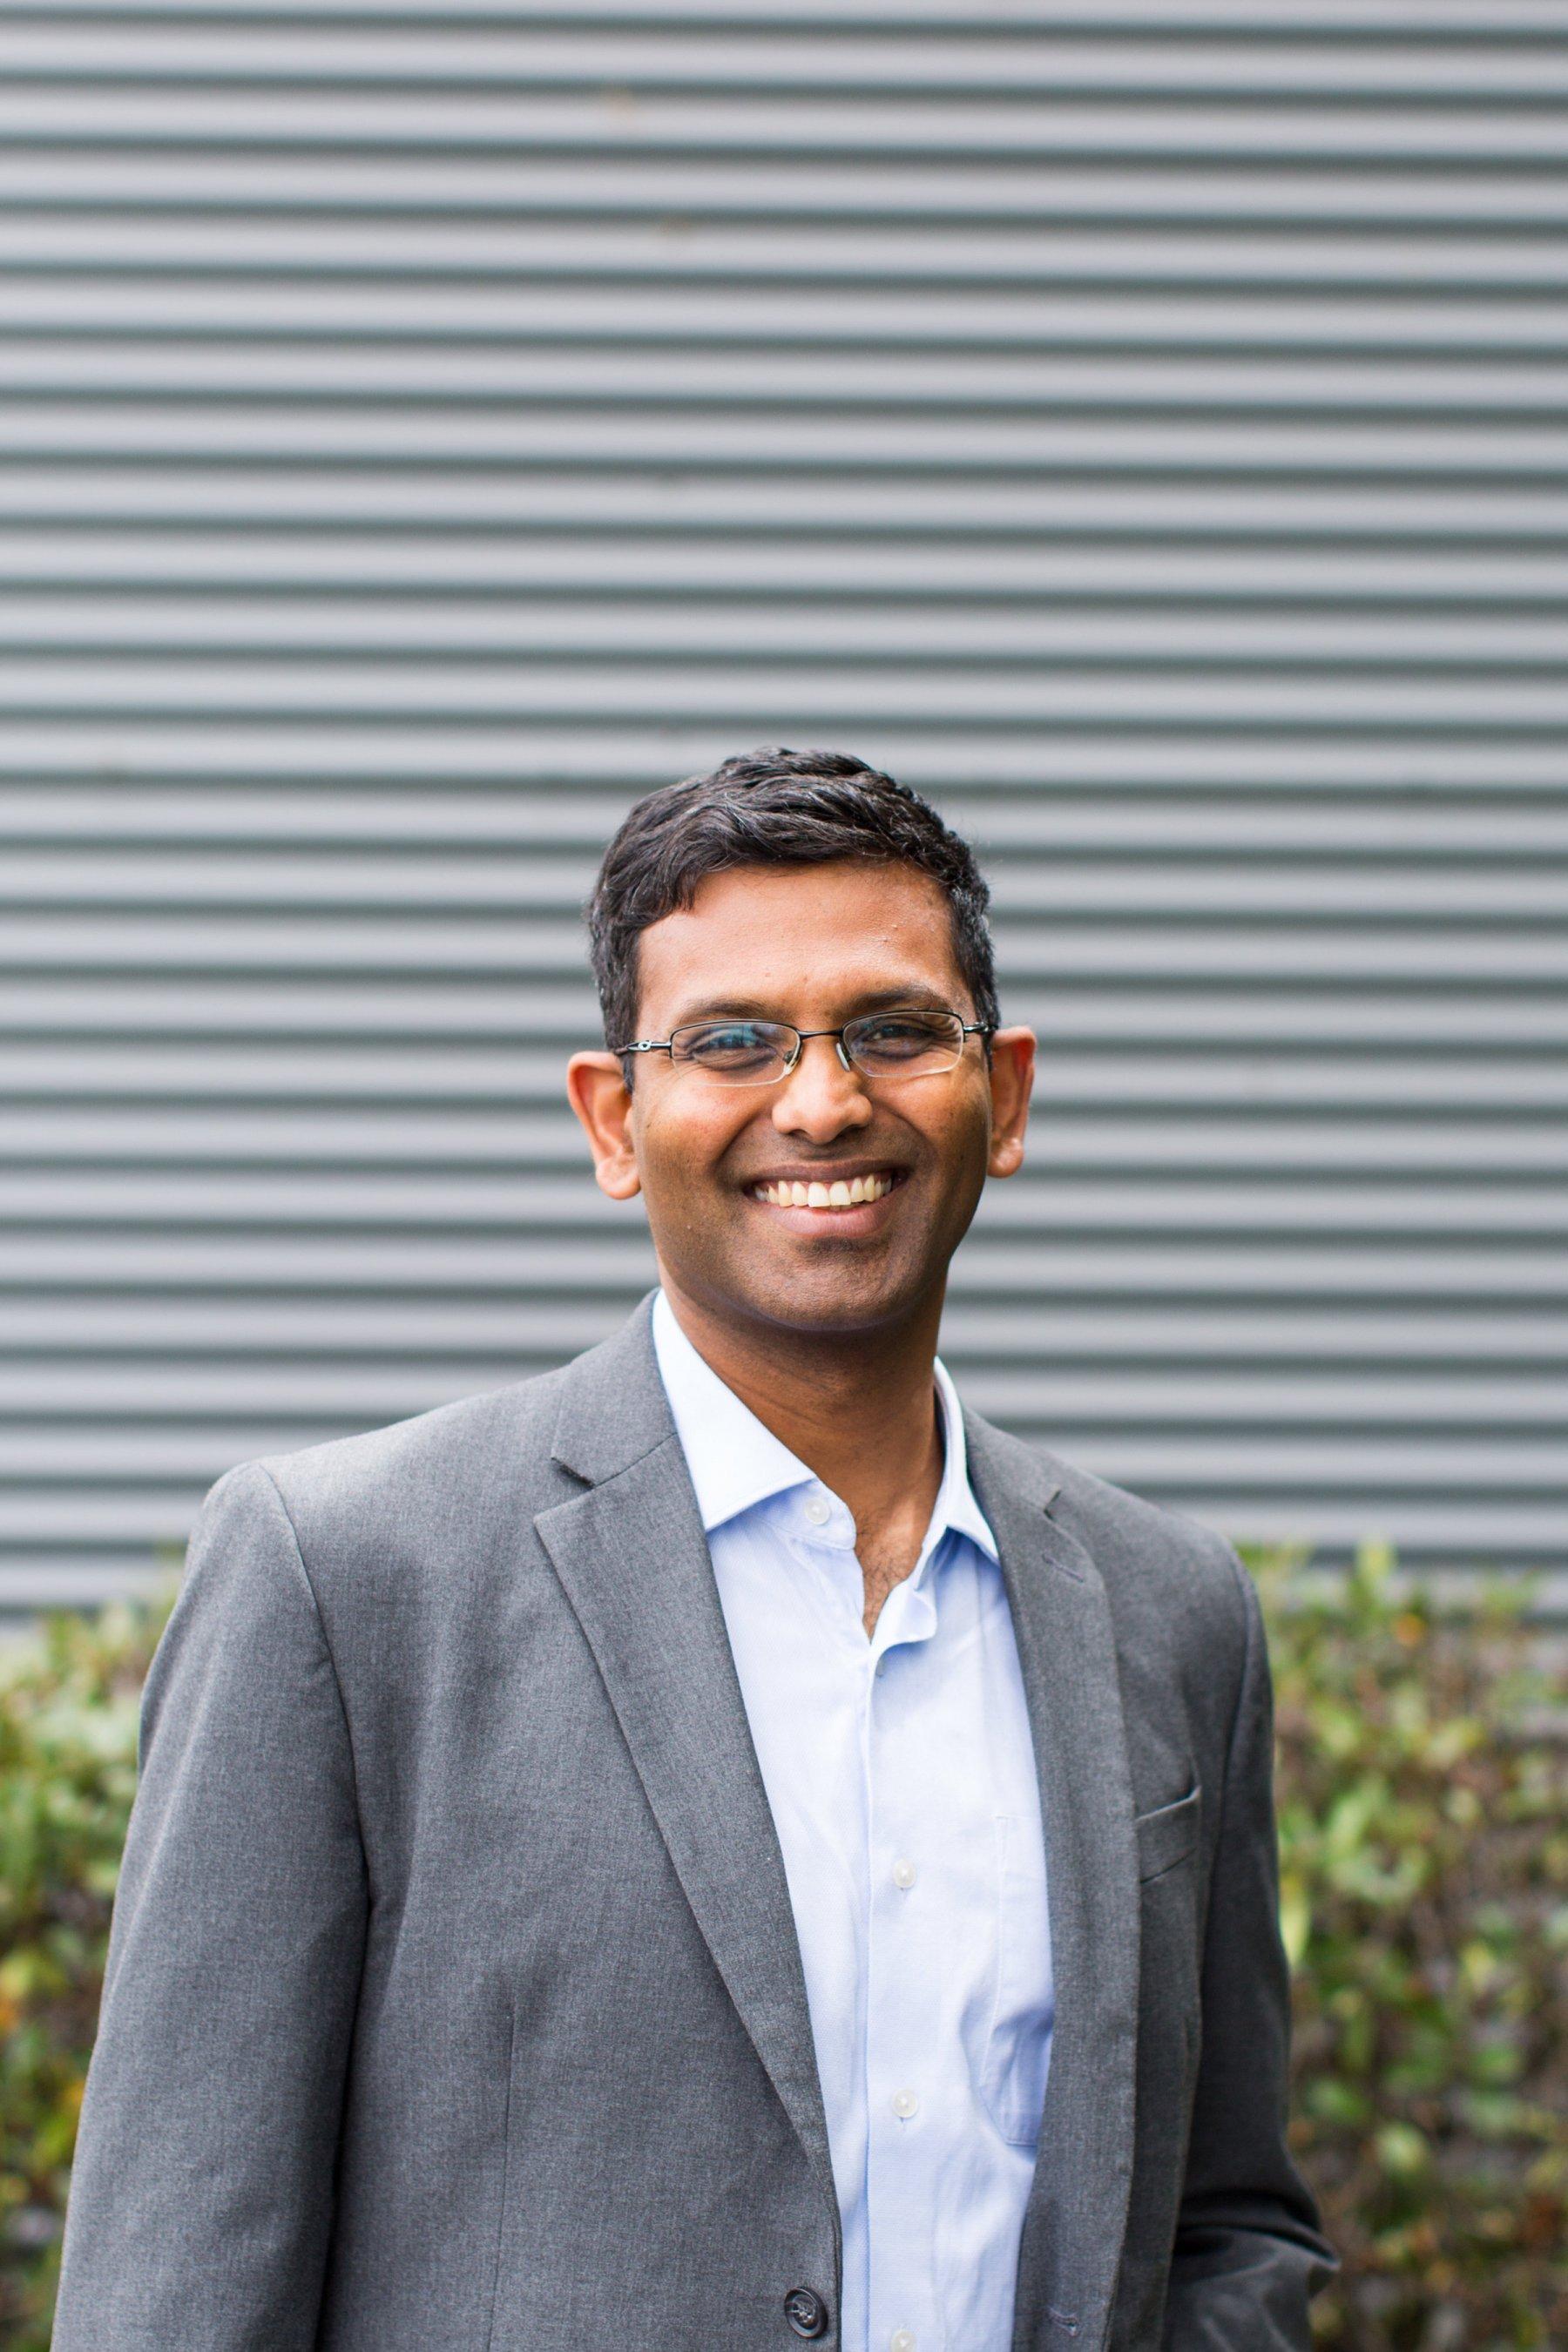 Raj Rajamani ist neuer VP of Product Management bei SentinelOne